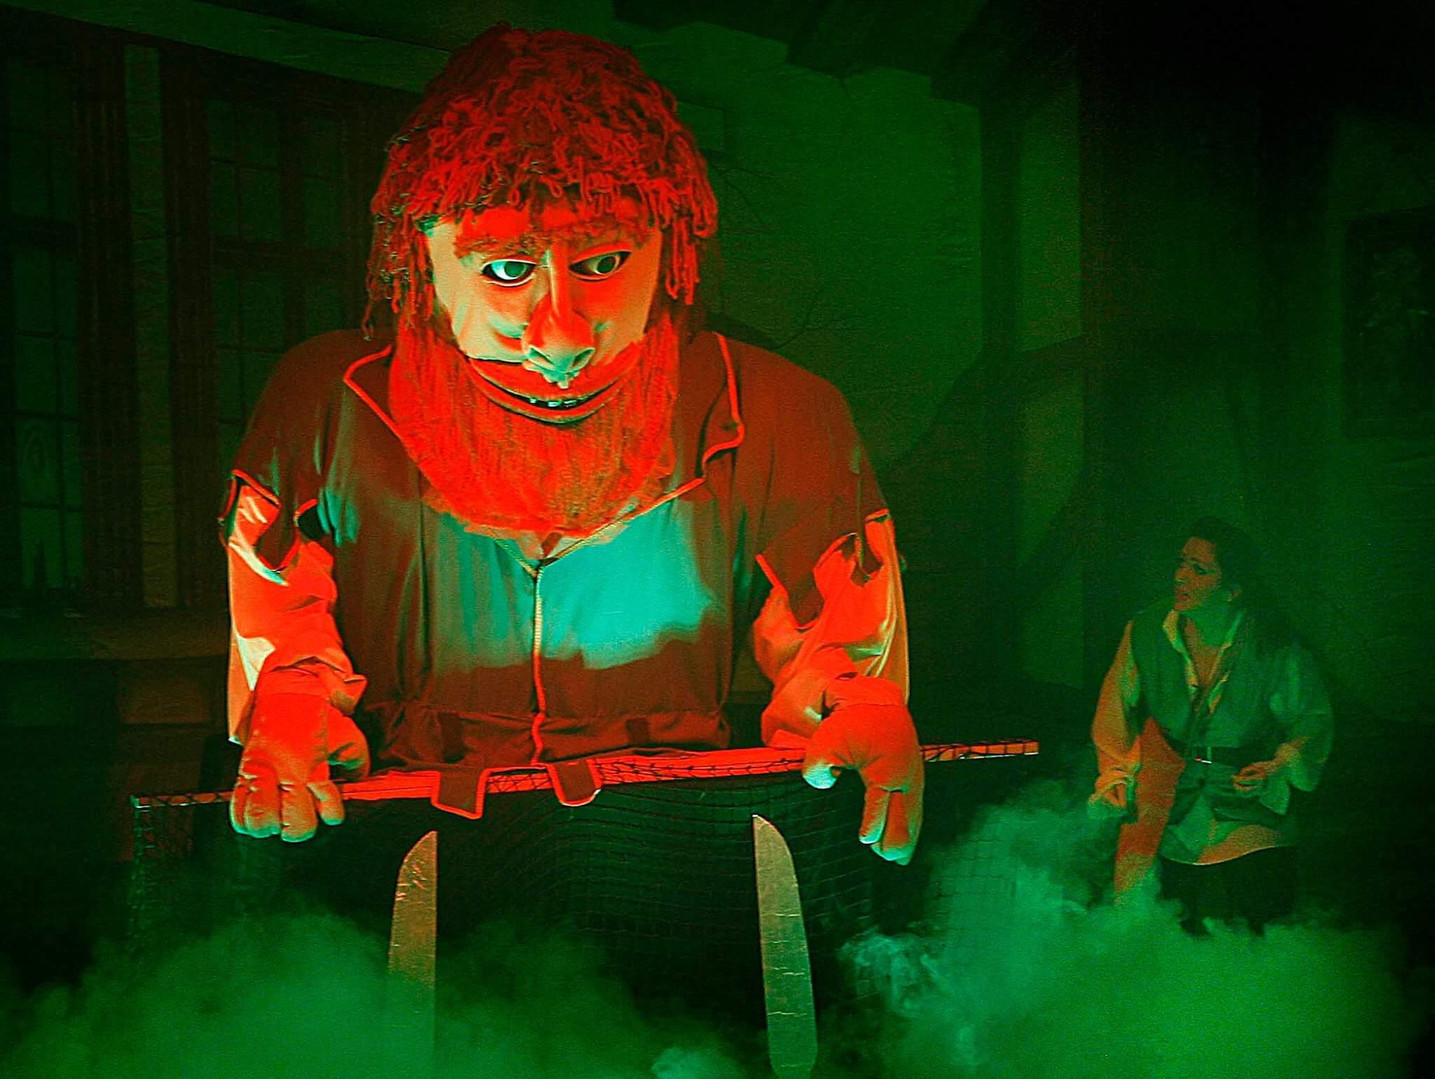 Jack & The Giant - Jack & The Beanstalk